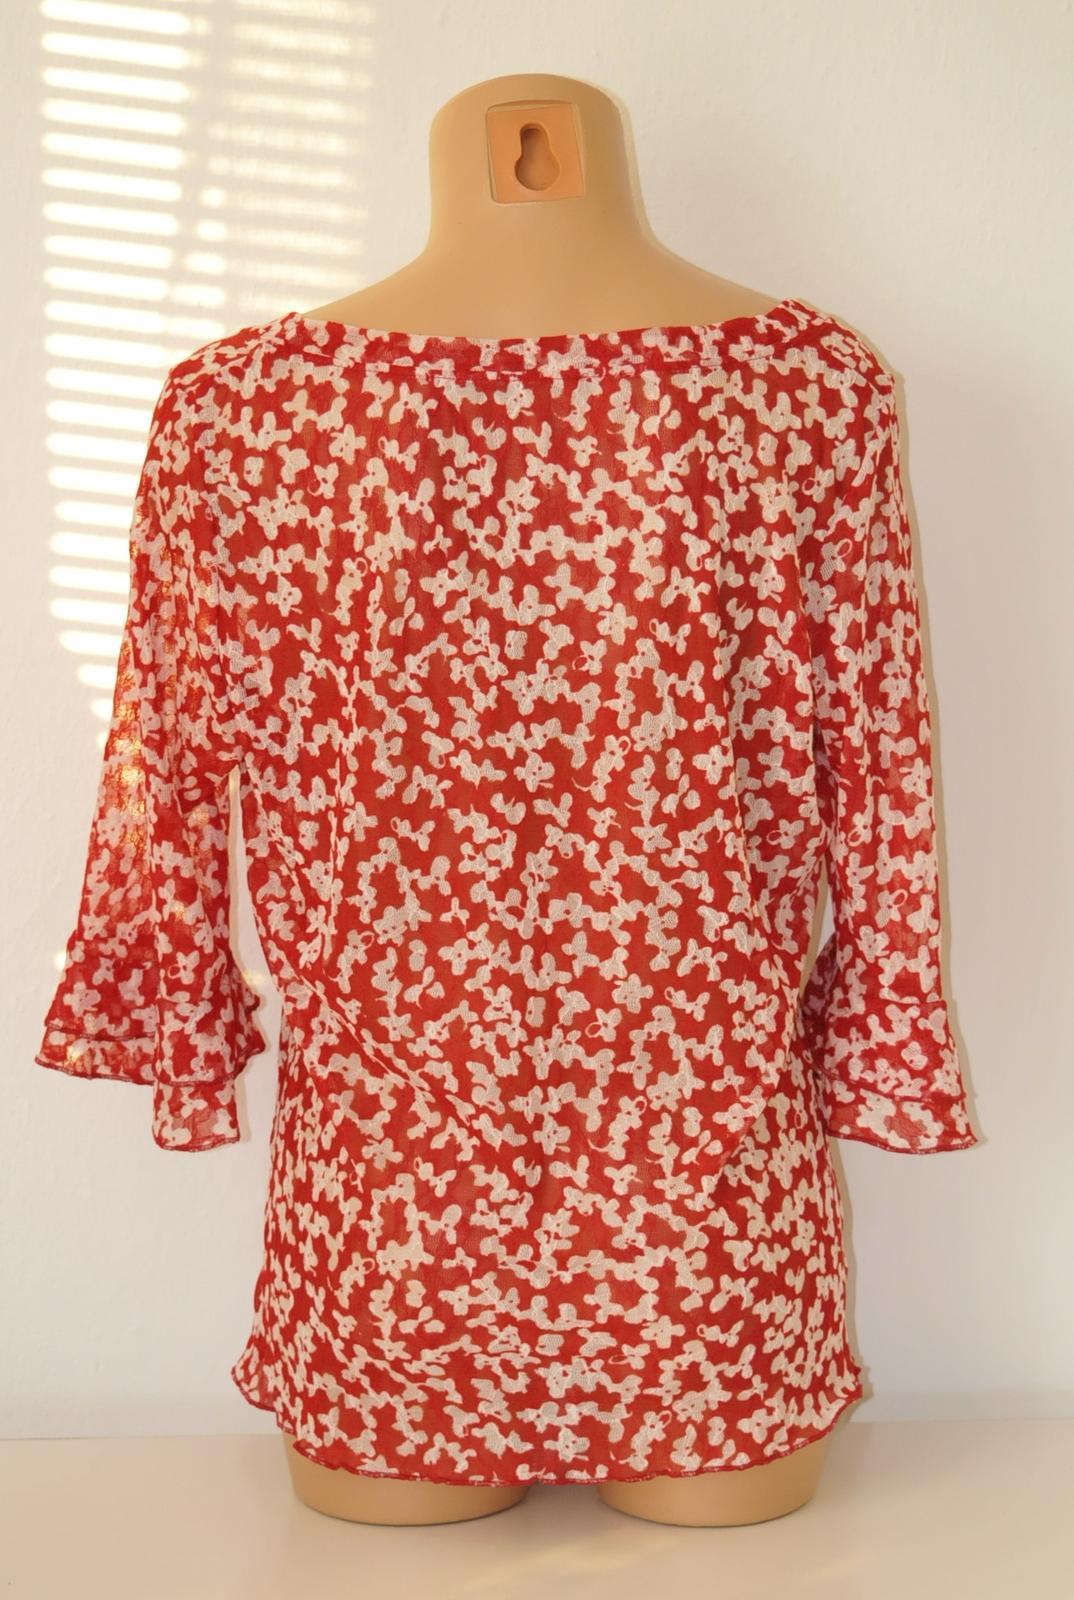 Dámske tričko - Obrázok č. 4